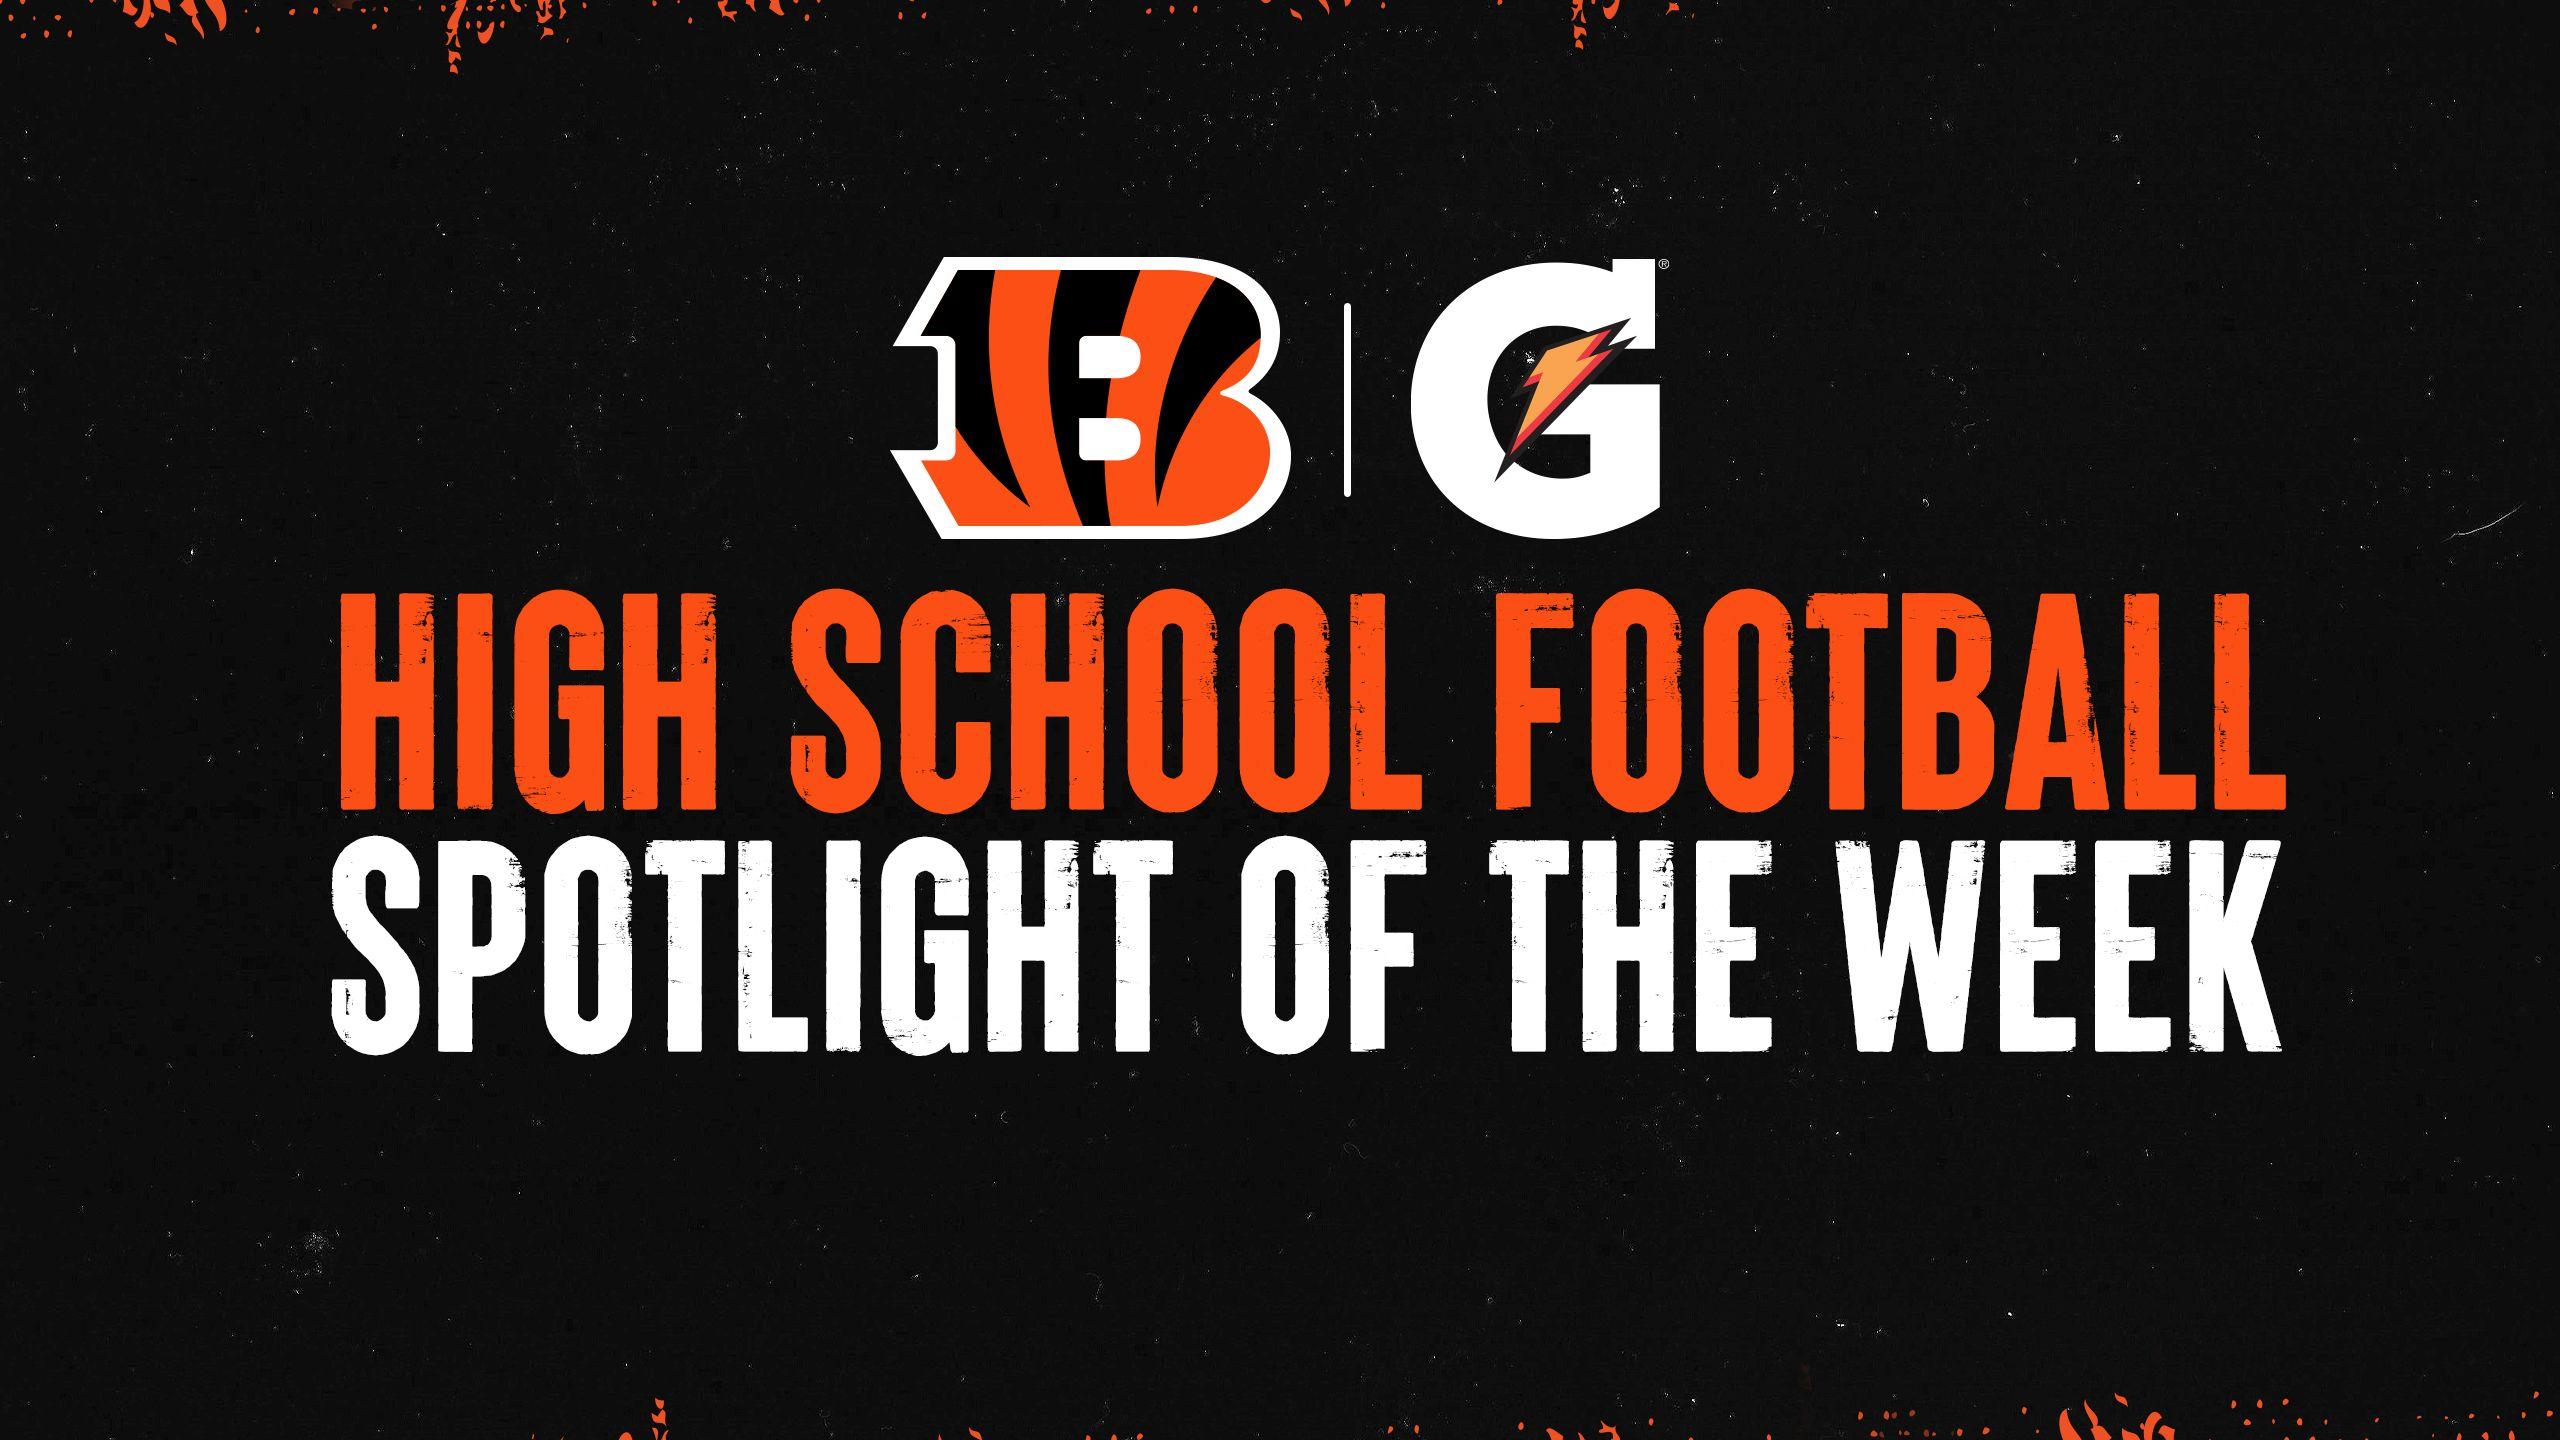 Gatorade High School Football Spotlight of the Week